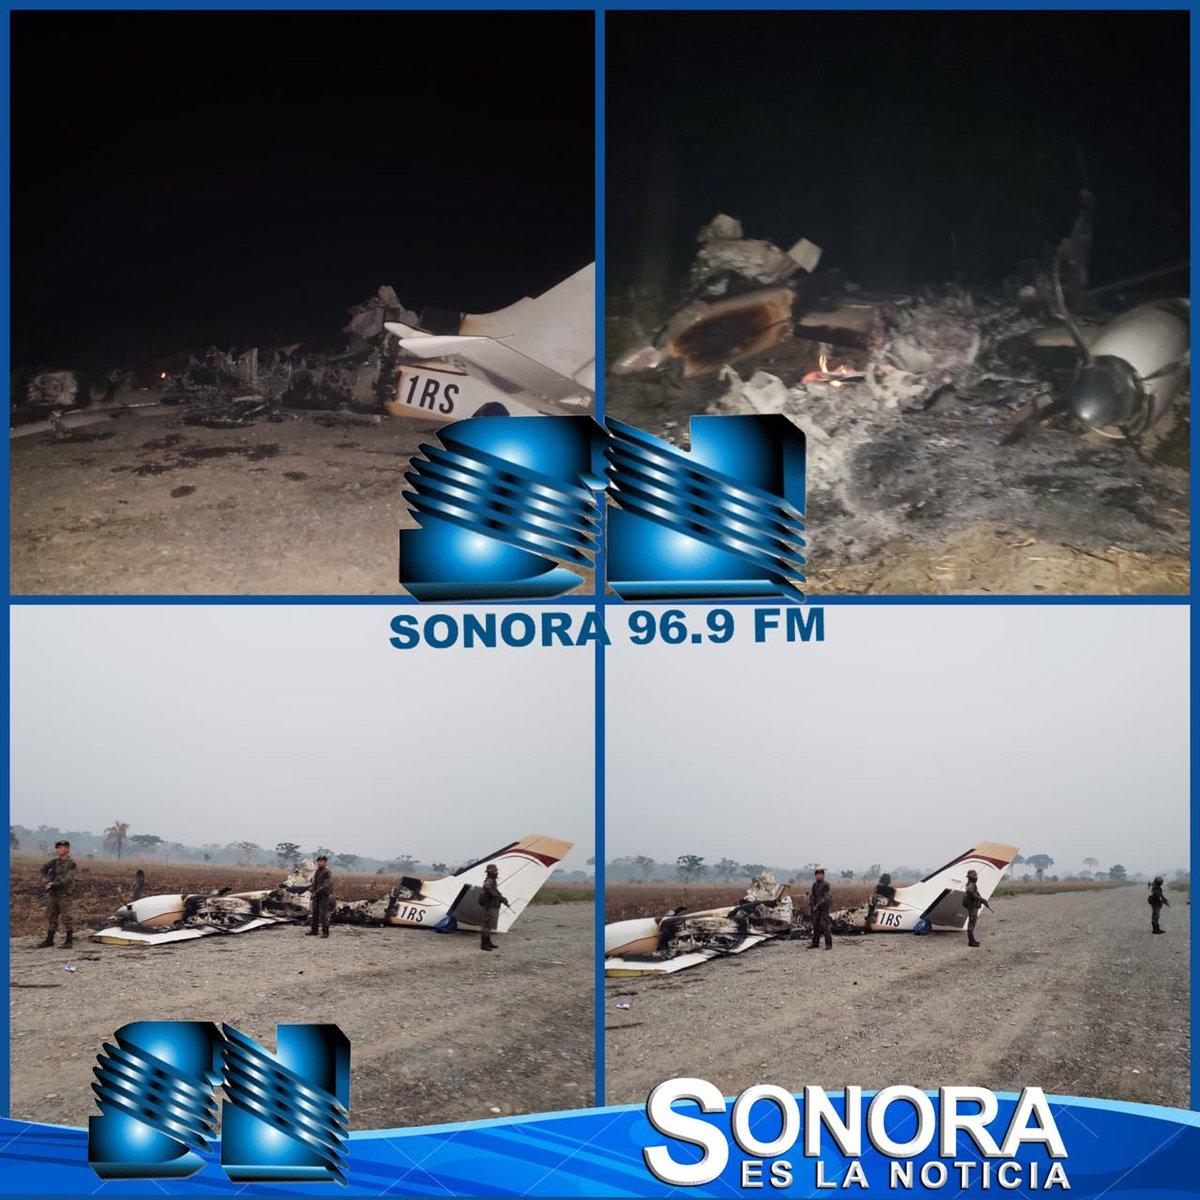 Radio SONORA 96.9 FM's photo on narcos